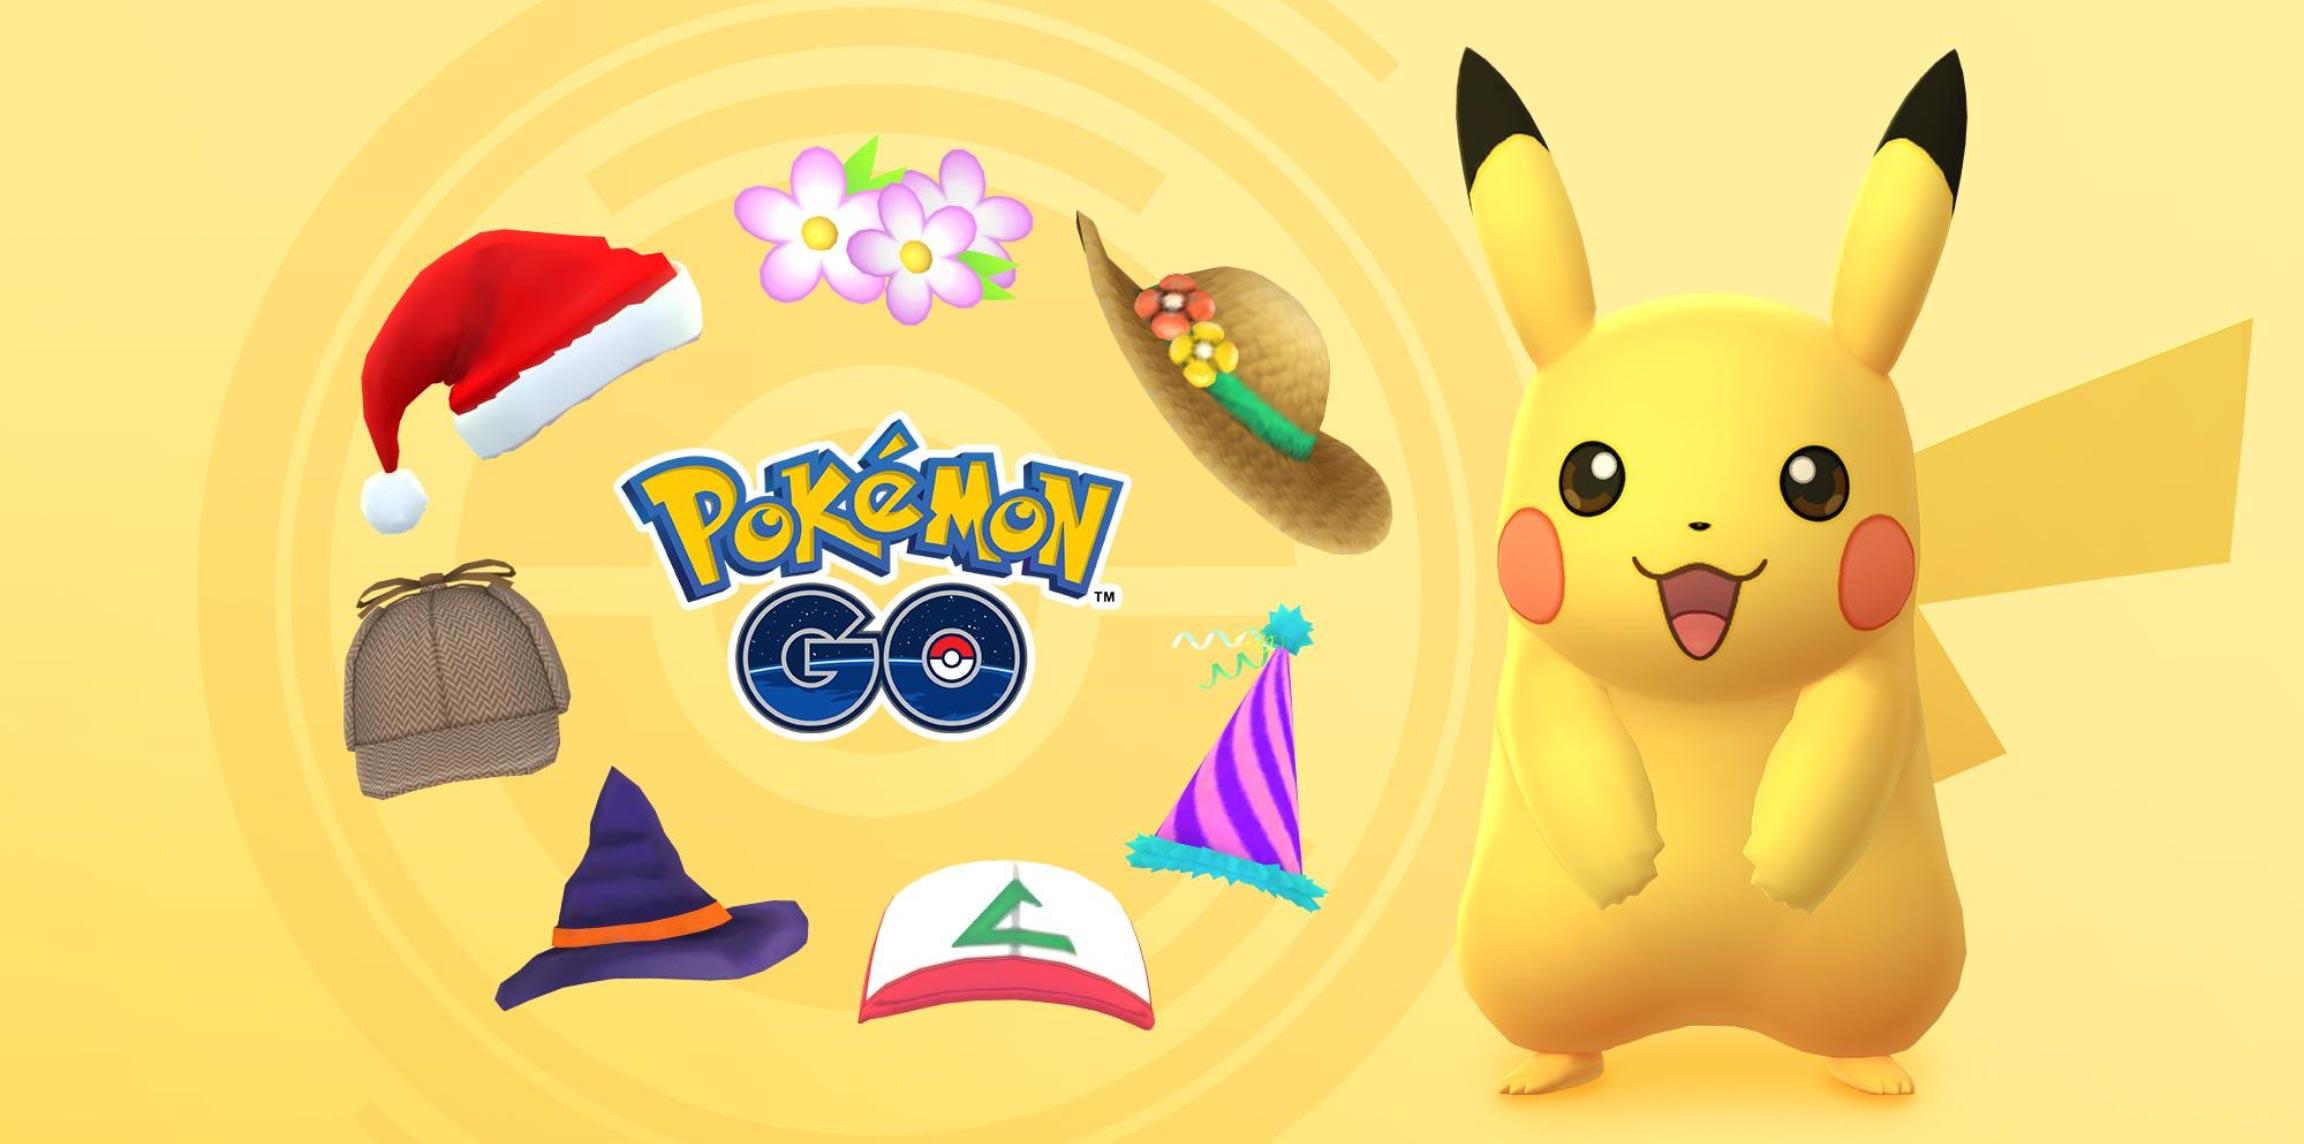 Pikachu's meta costume for Pokémon Go's Halloween event